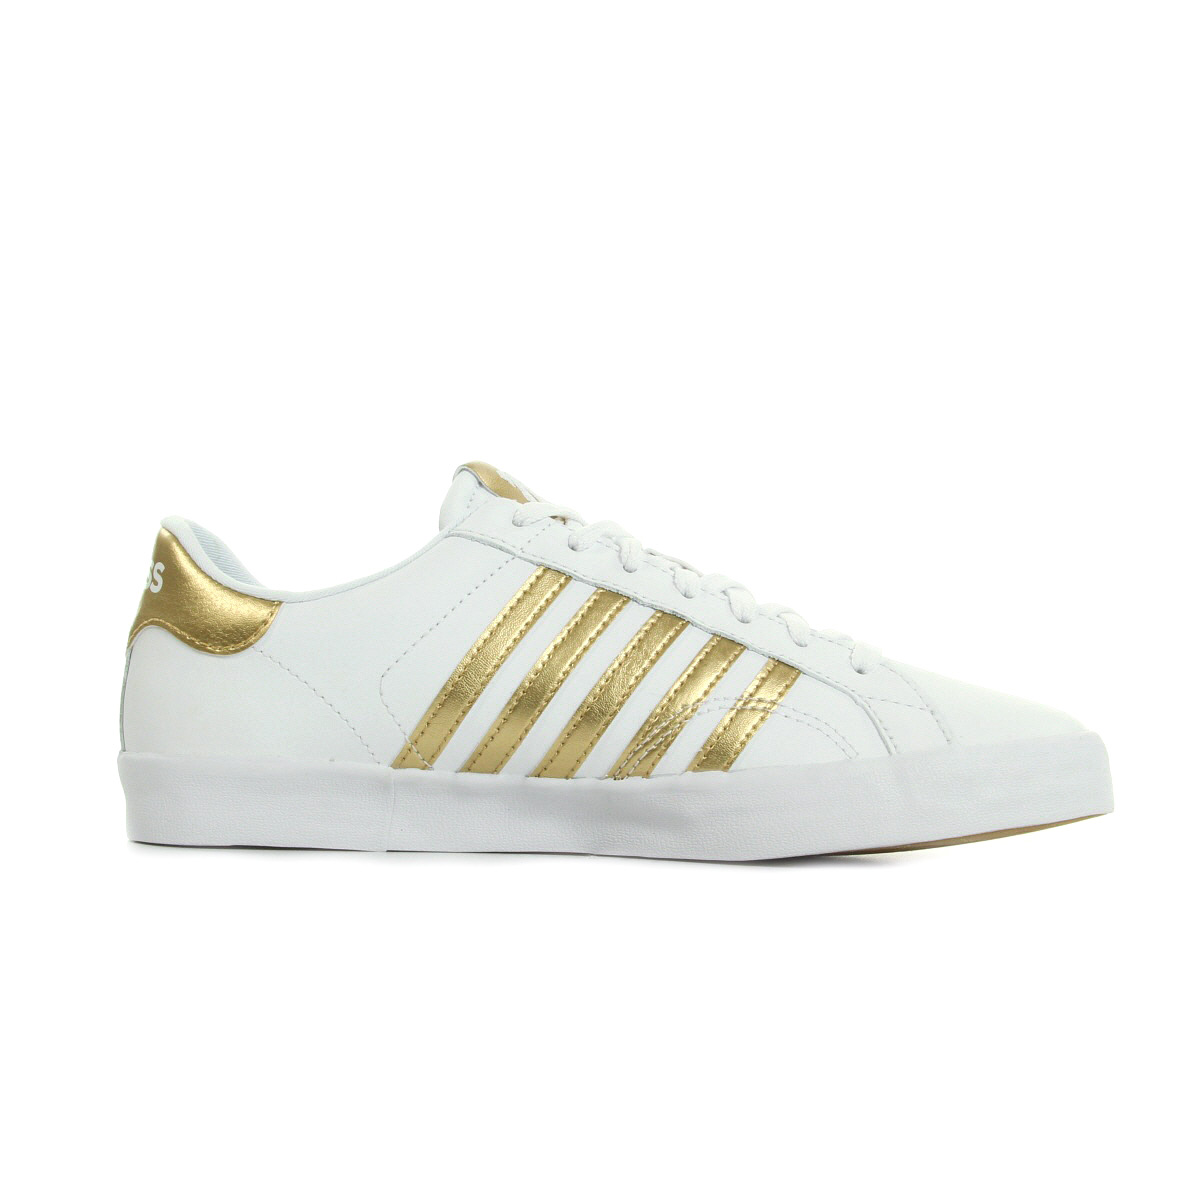 K-Swiss Belmont So White/Gold 73817A98, Baskets mode femme